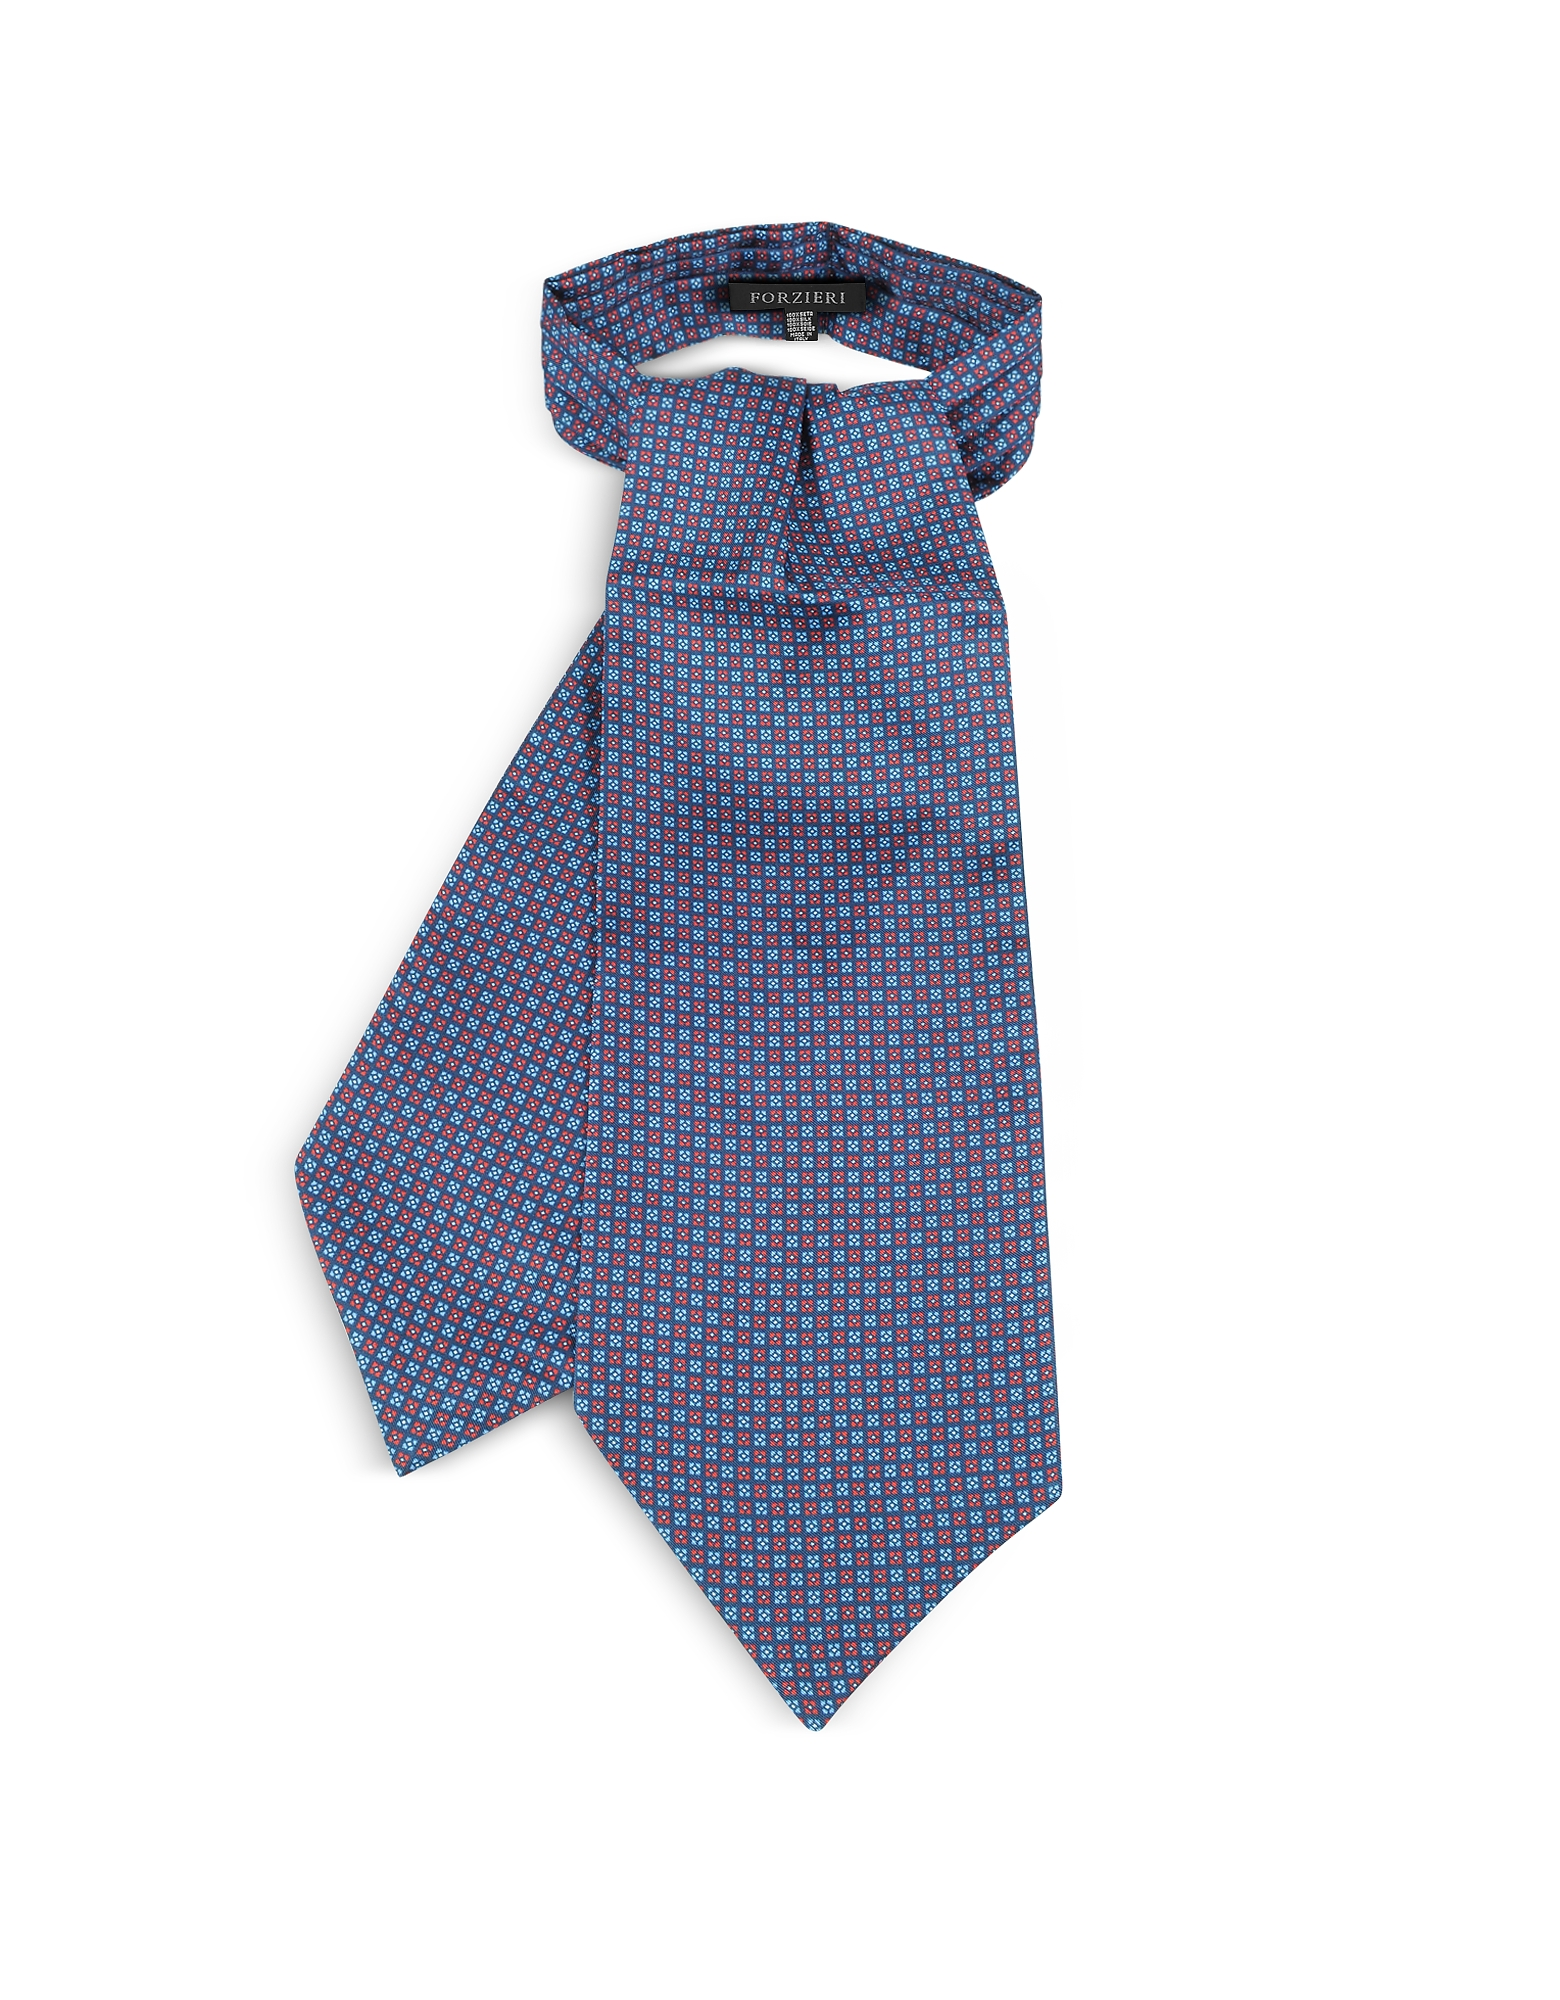 Forzieri Ascot ties, Two Tone Mini Squares Geometric Print Silk Tie Ascot